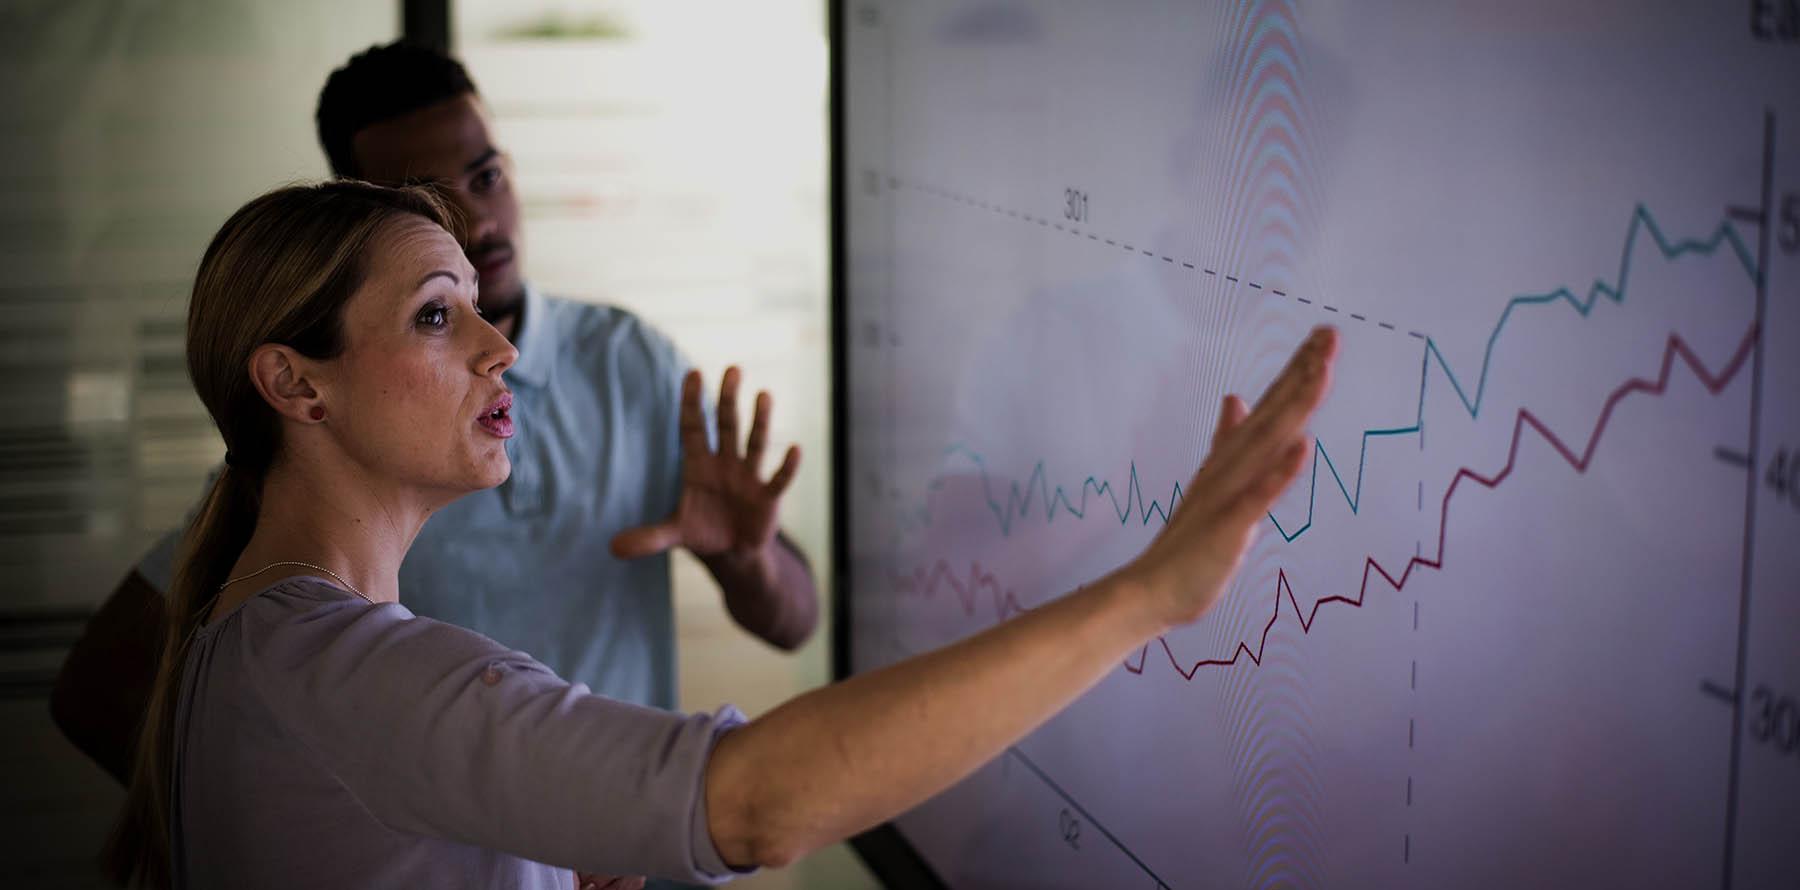 Business woman explaining a graph.